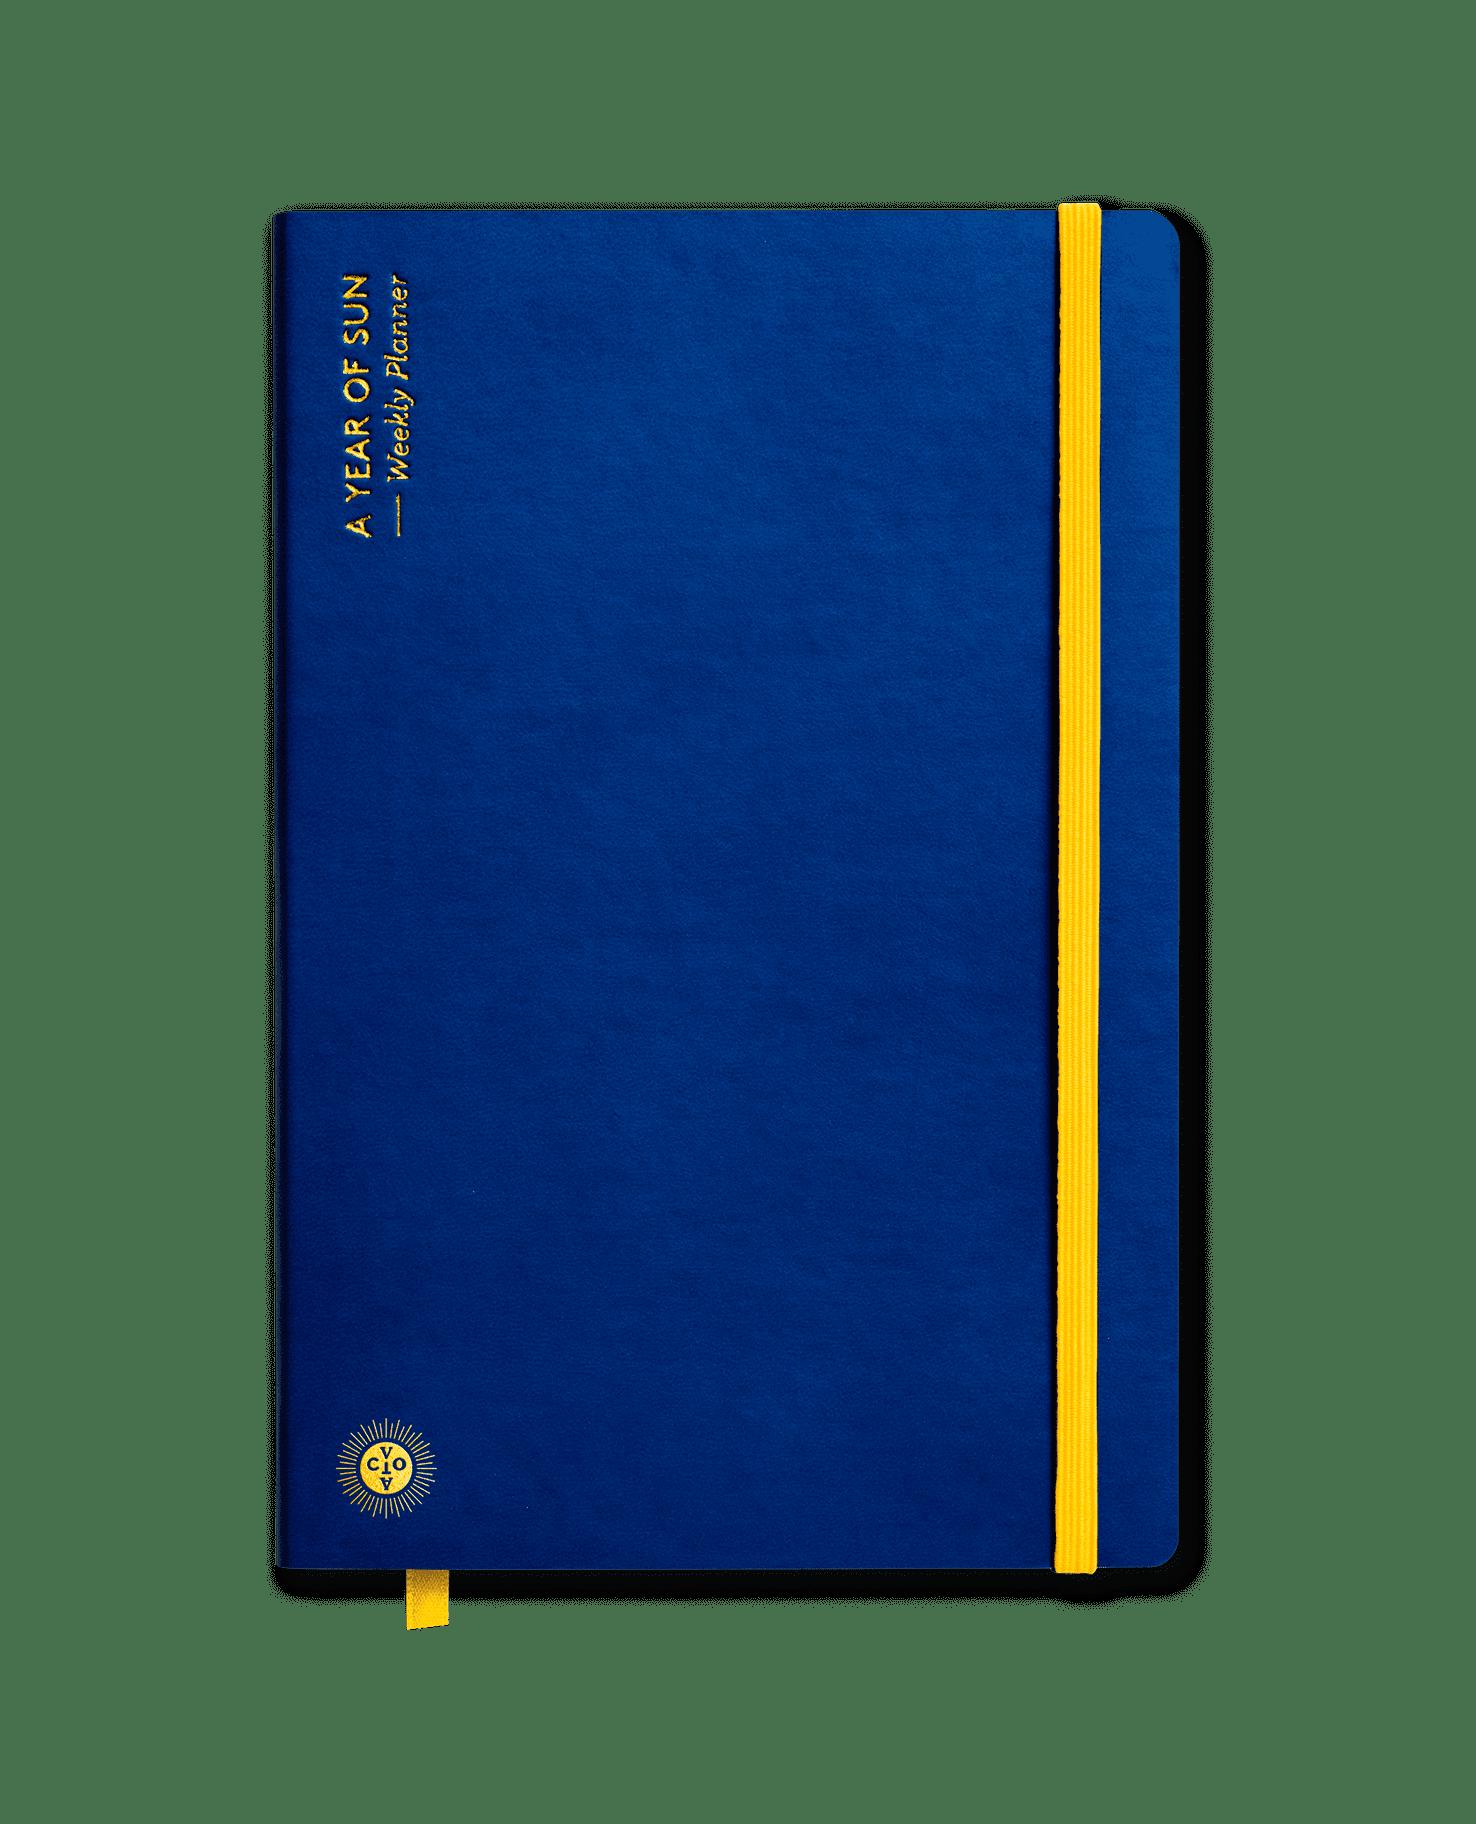 OABY-15 - Agenda A Year Of Sun